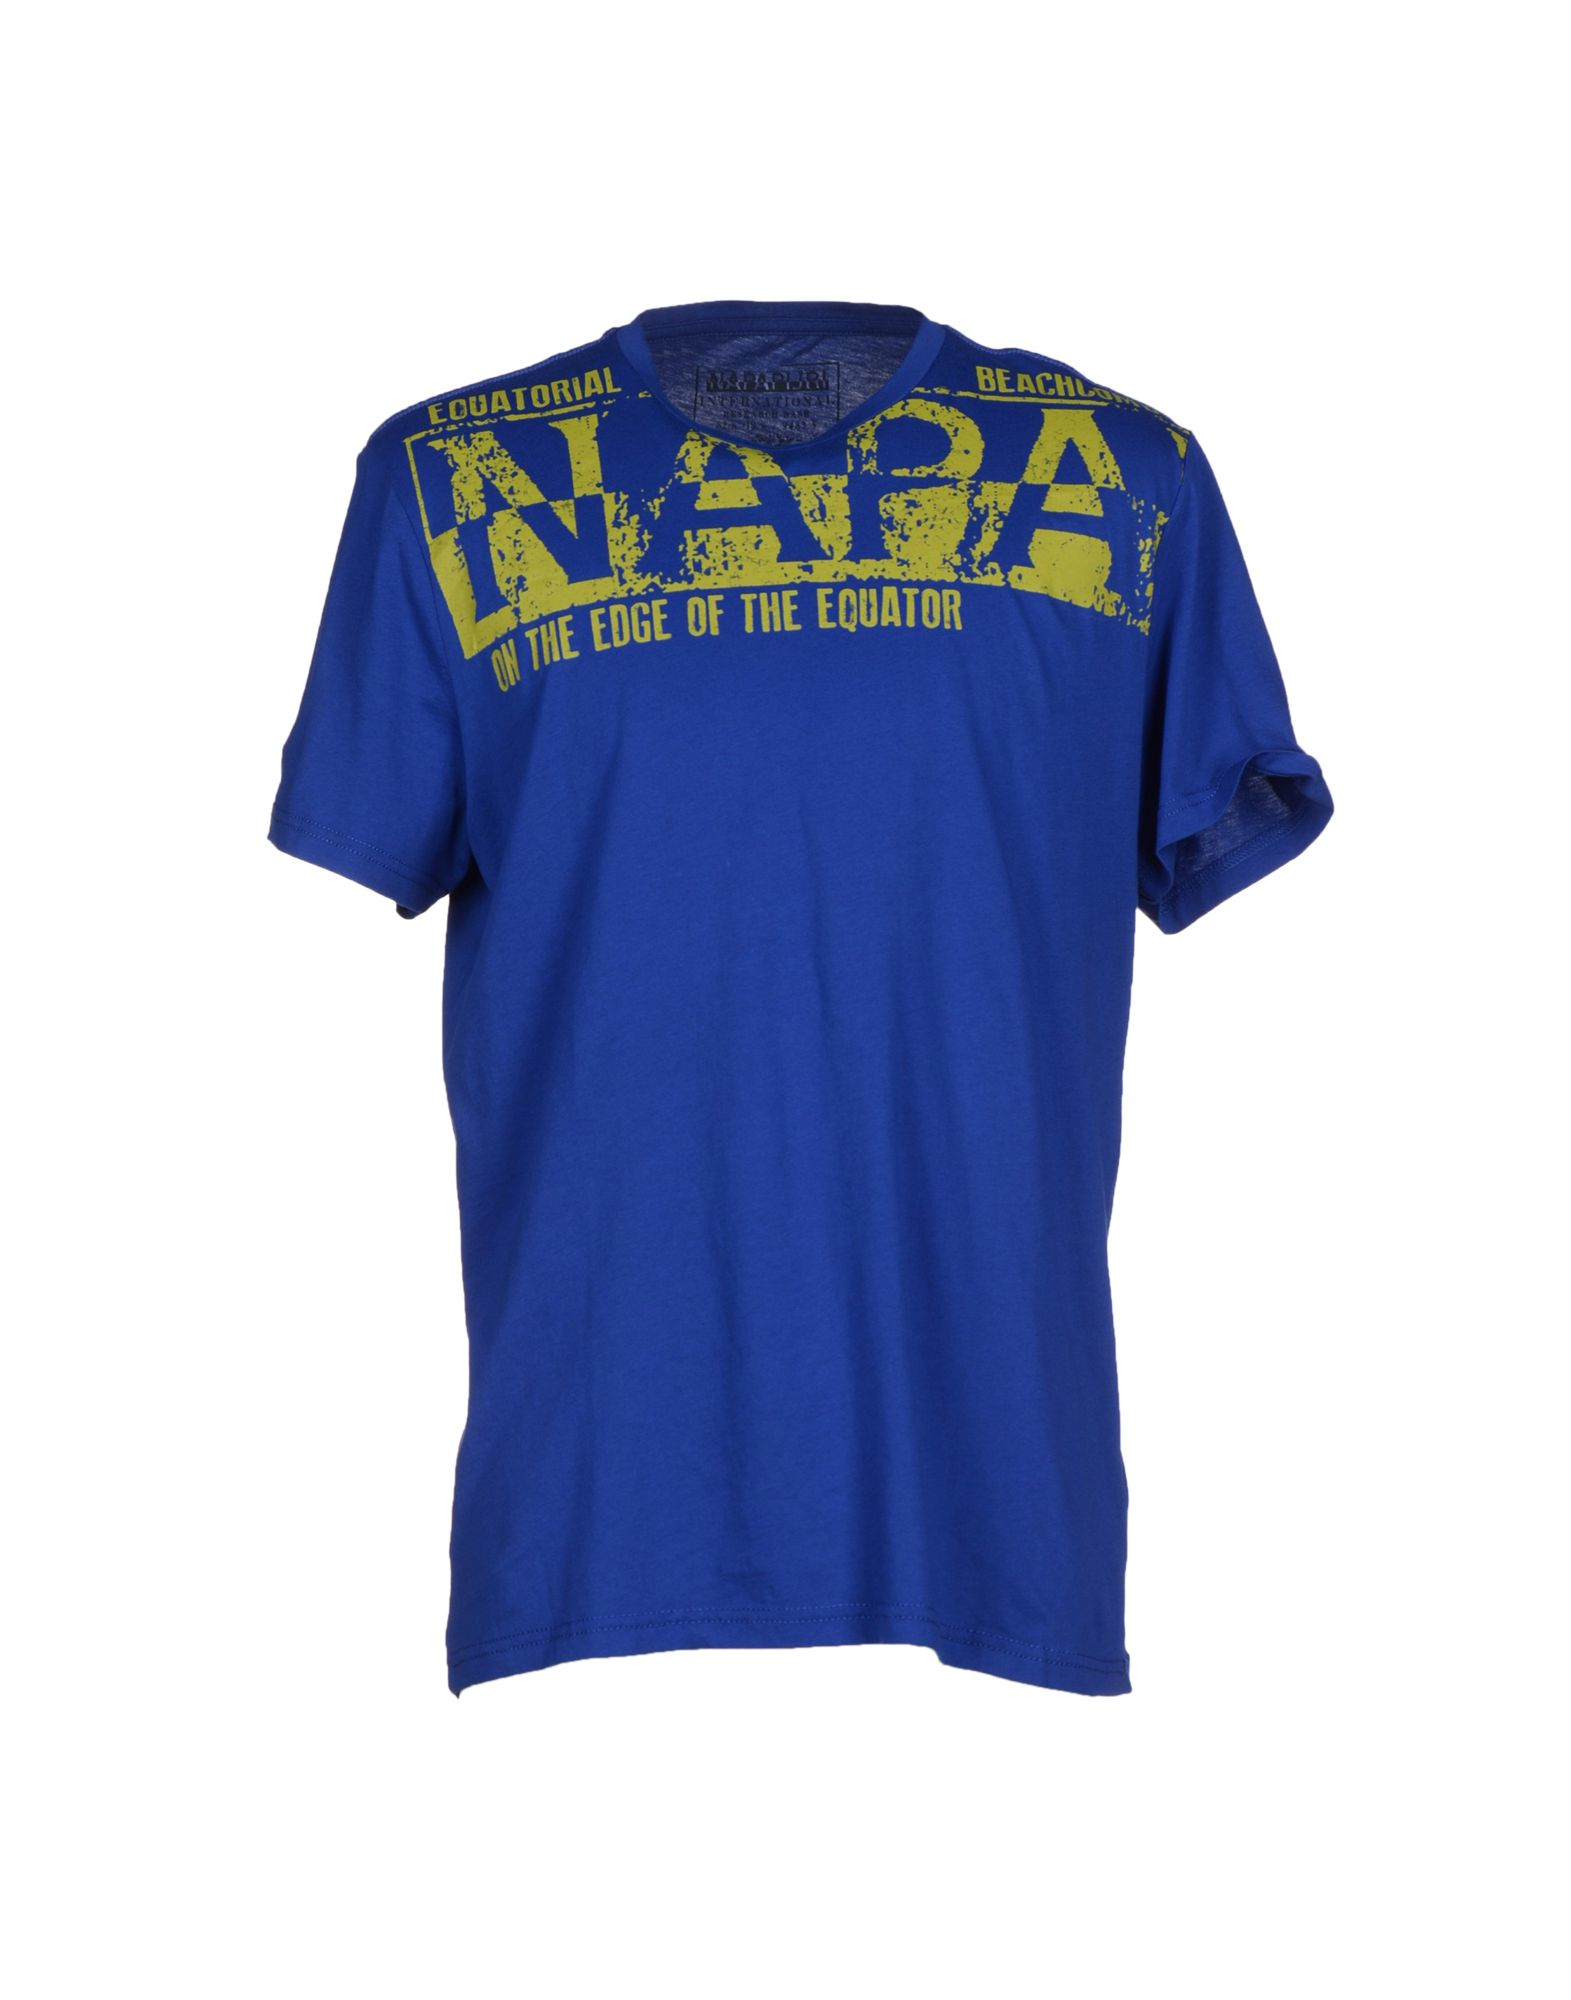 lyst napapijri t shirt in blue for men. Black Bedroom Furniture Sets. Home Design Ideas